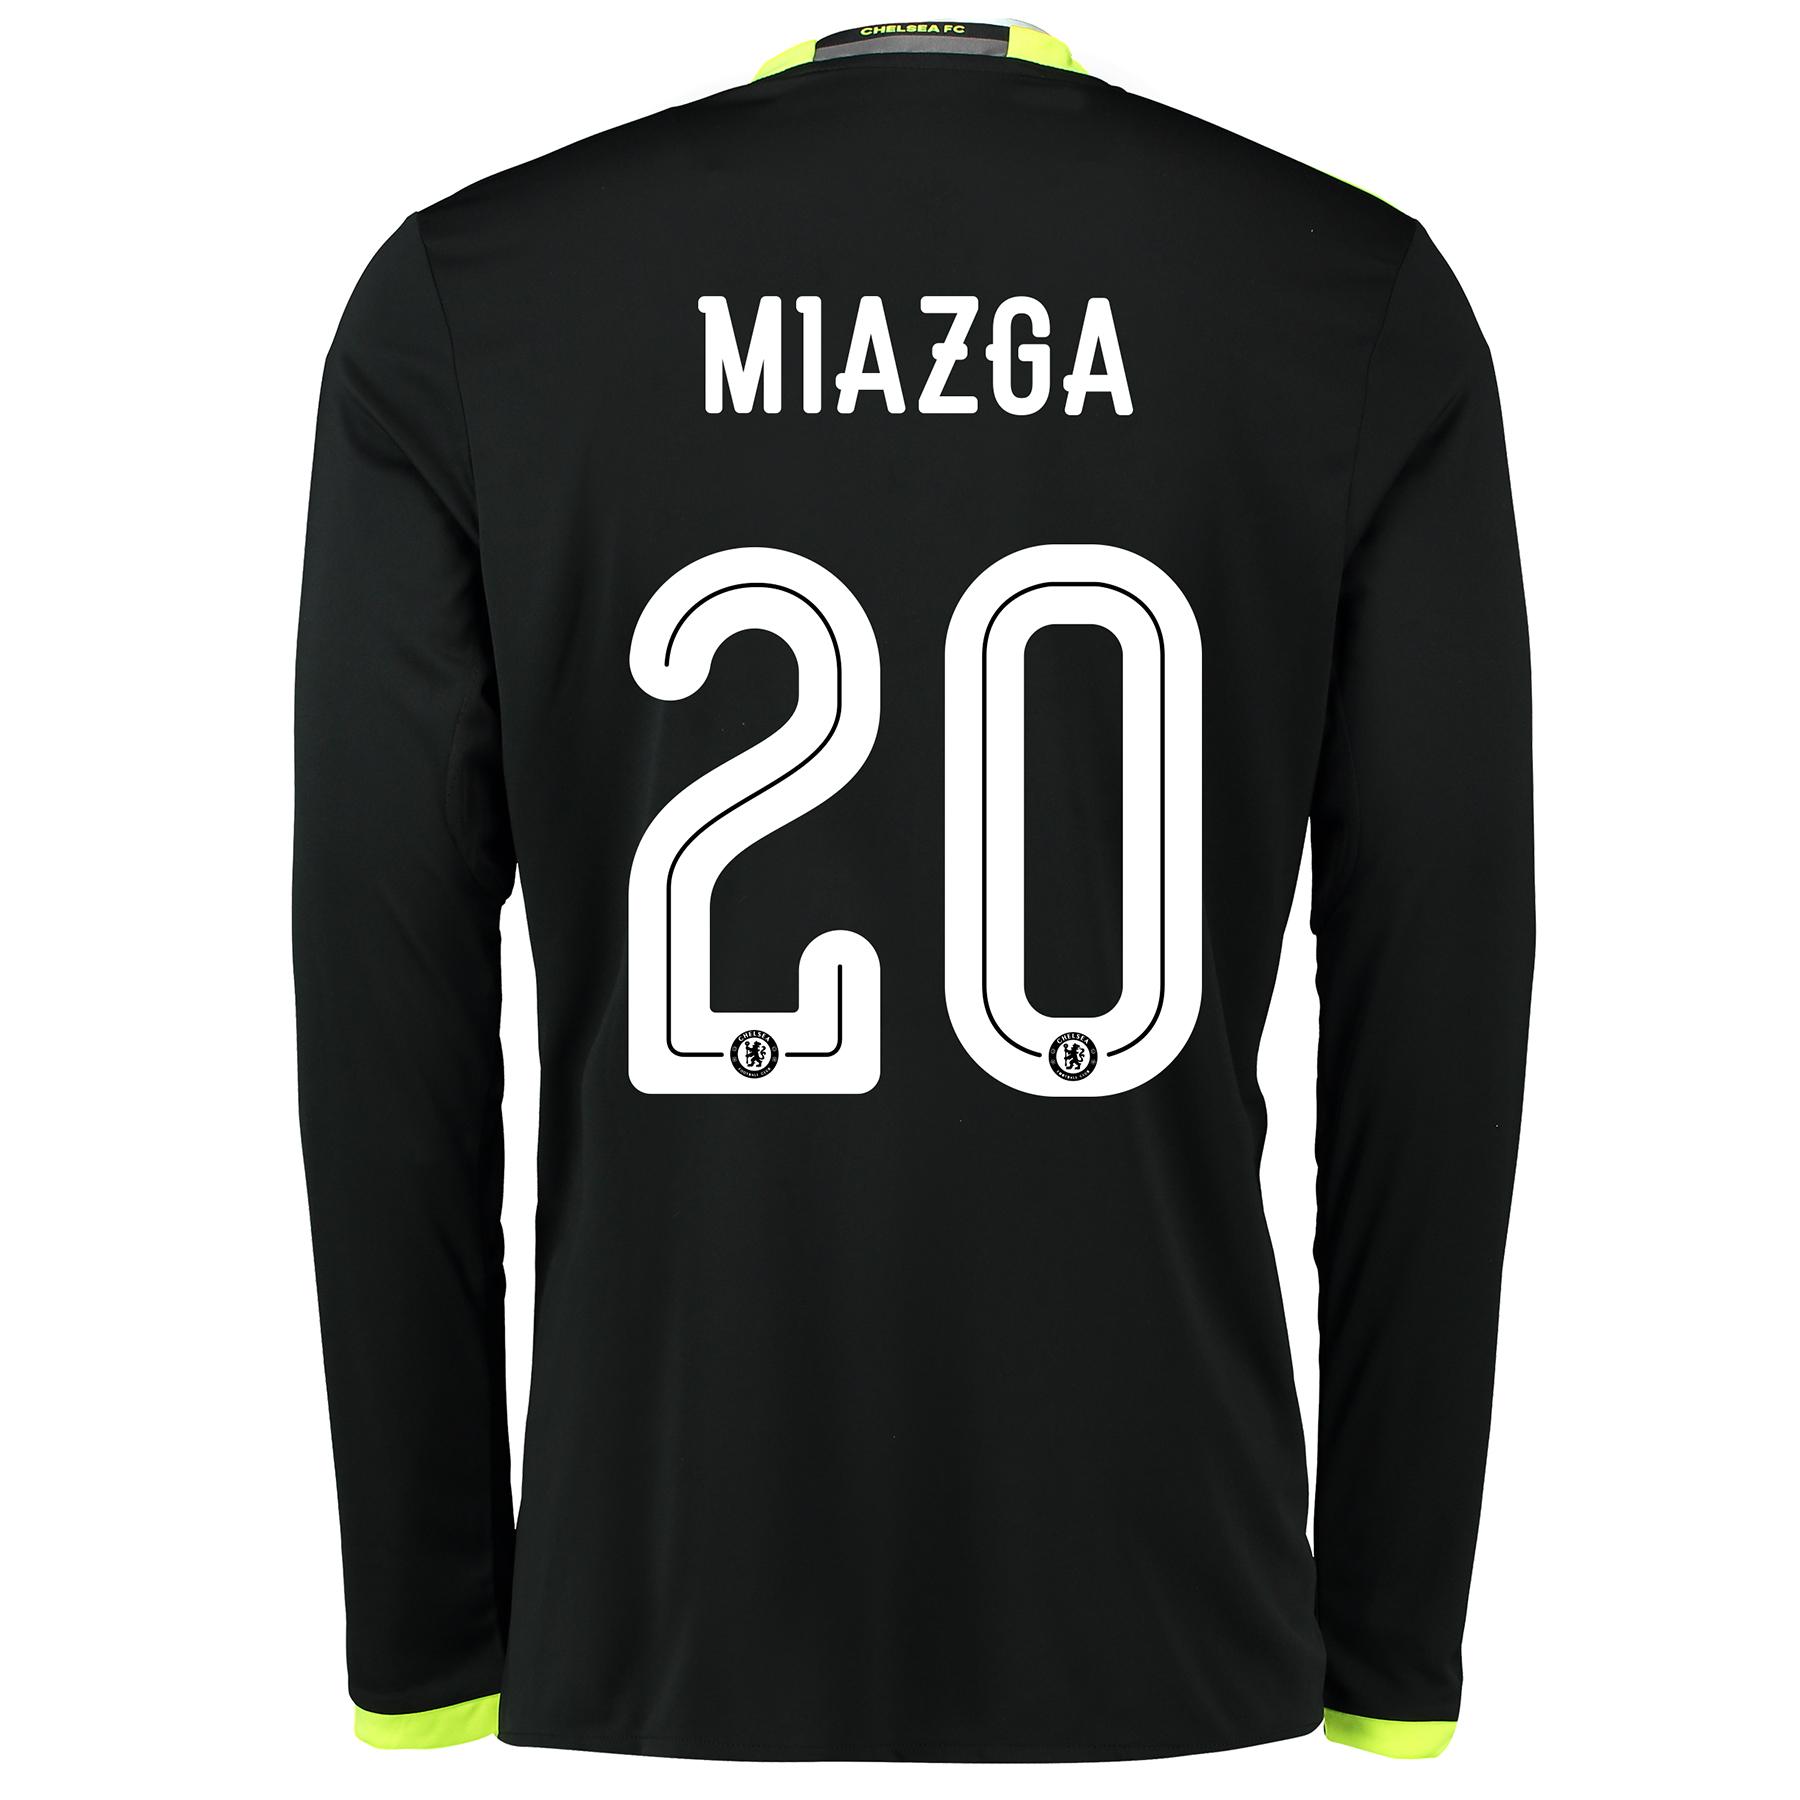 Chelsea Linear Away Shirt 16-17 - Kids - Long Sleeve with Miazga 20 pr